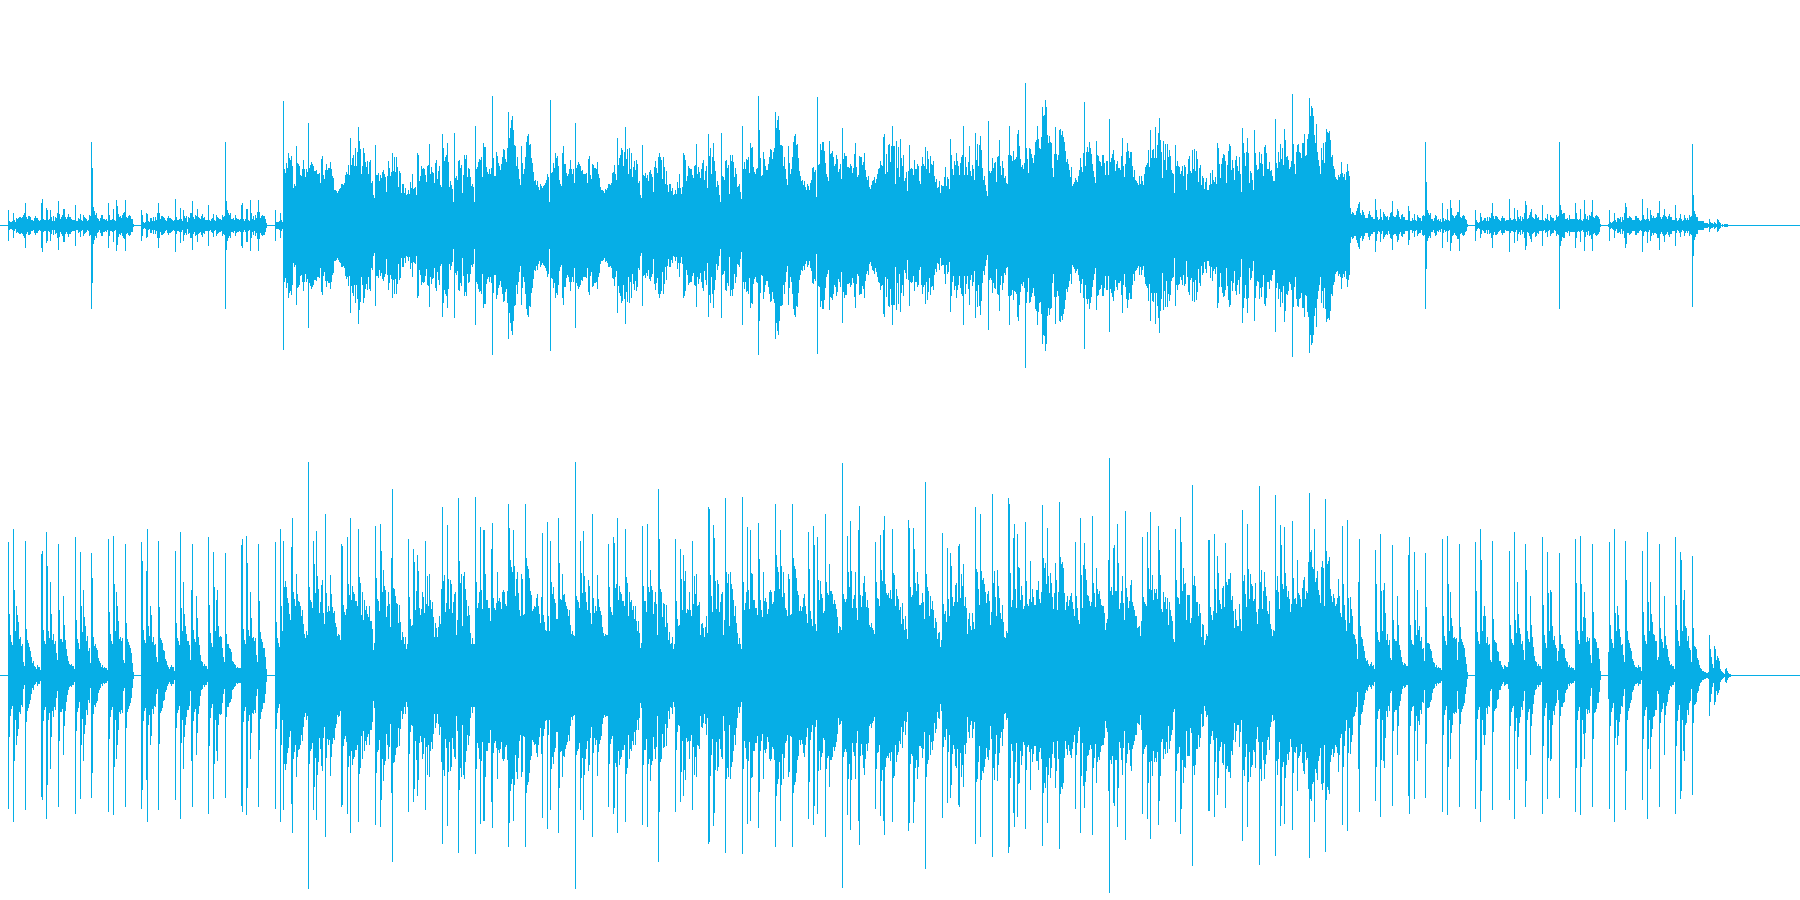 RPGの洞窟などで流れてそうなBGMの再生済みの波形